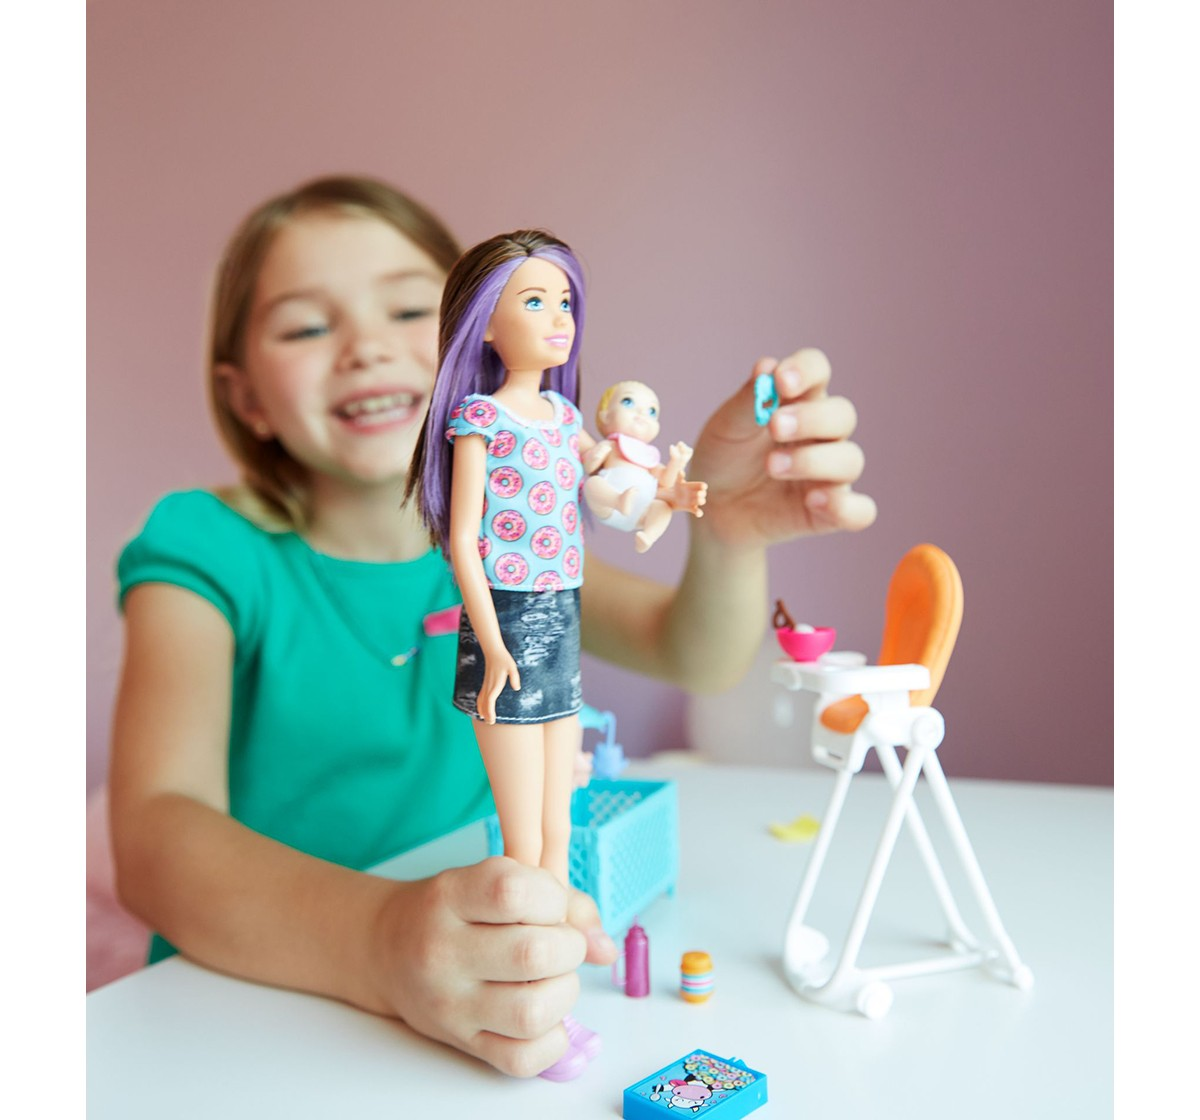 Barbie Skipper Babysitter, Doll and Stroller Set Dolls & Accessories for Girls age 3Y+